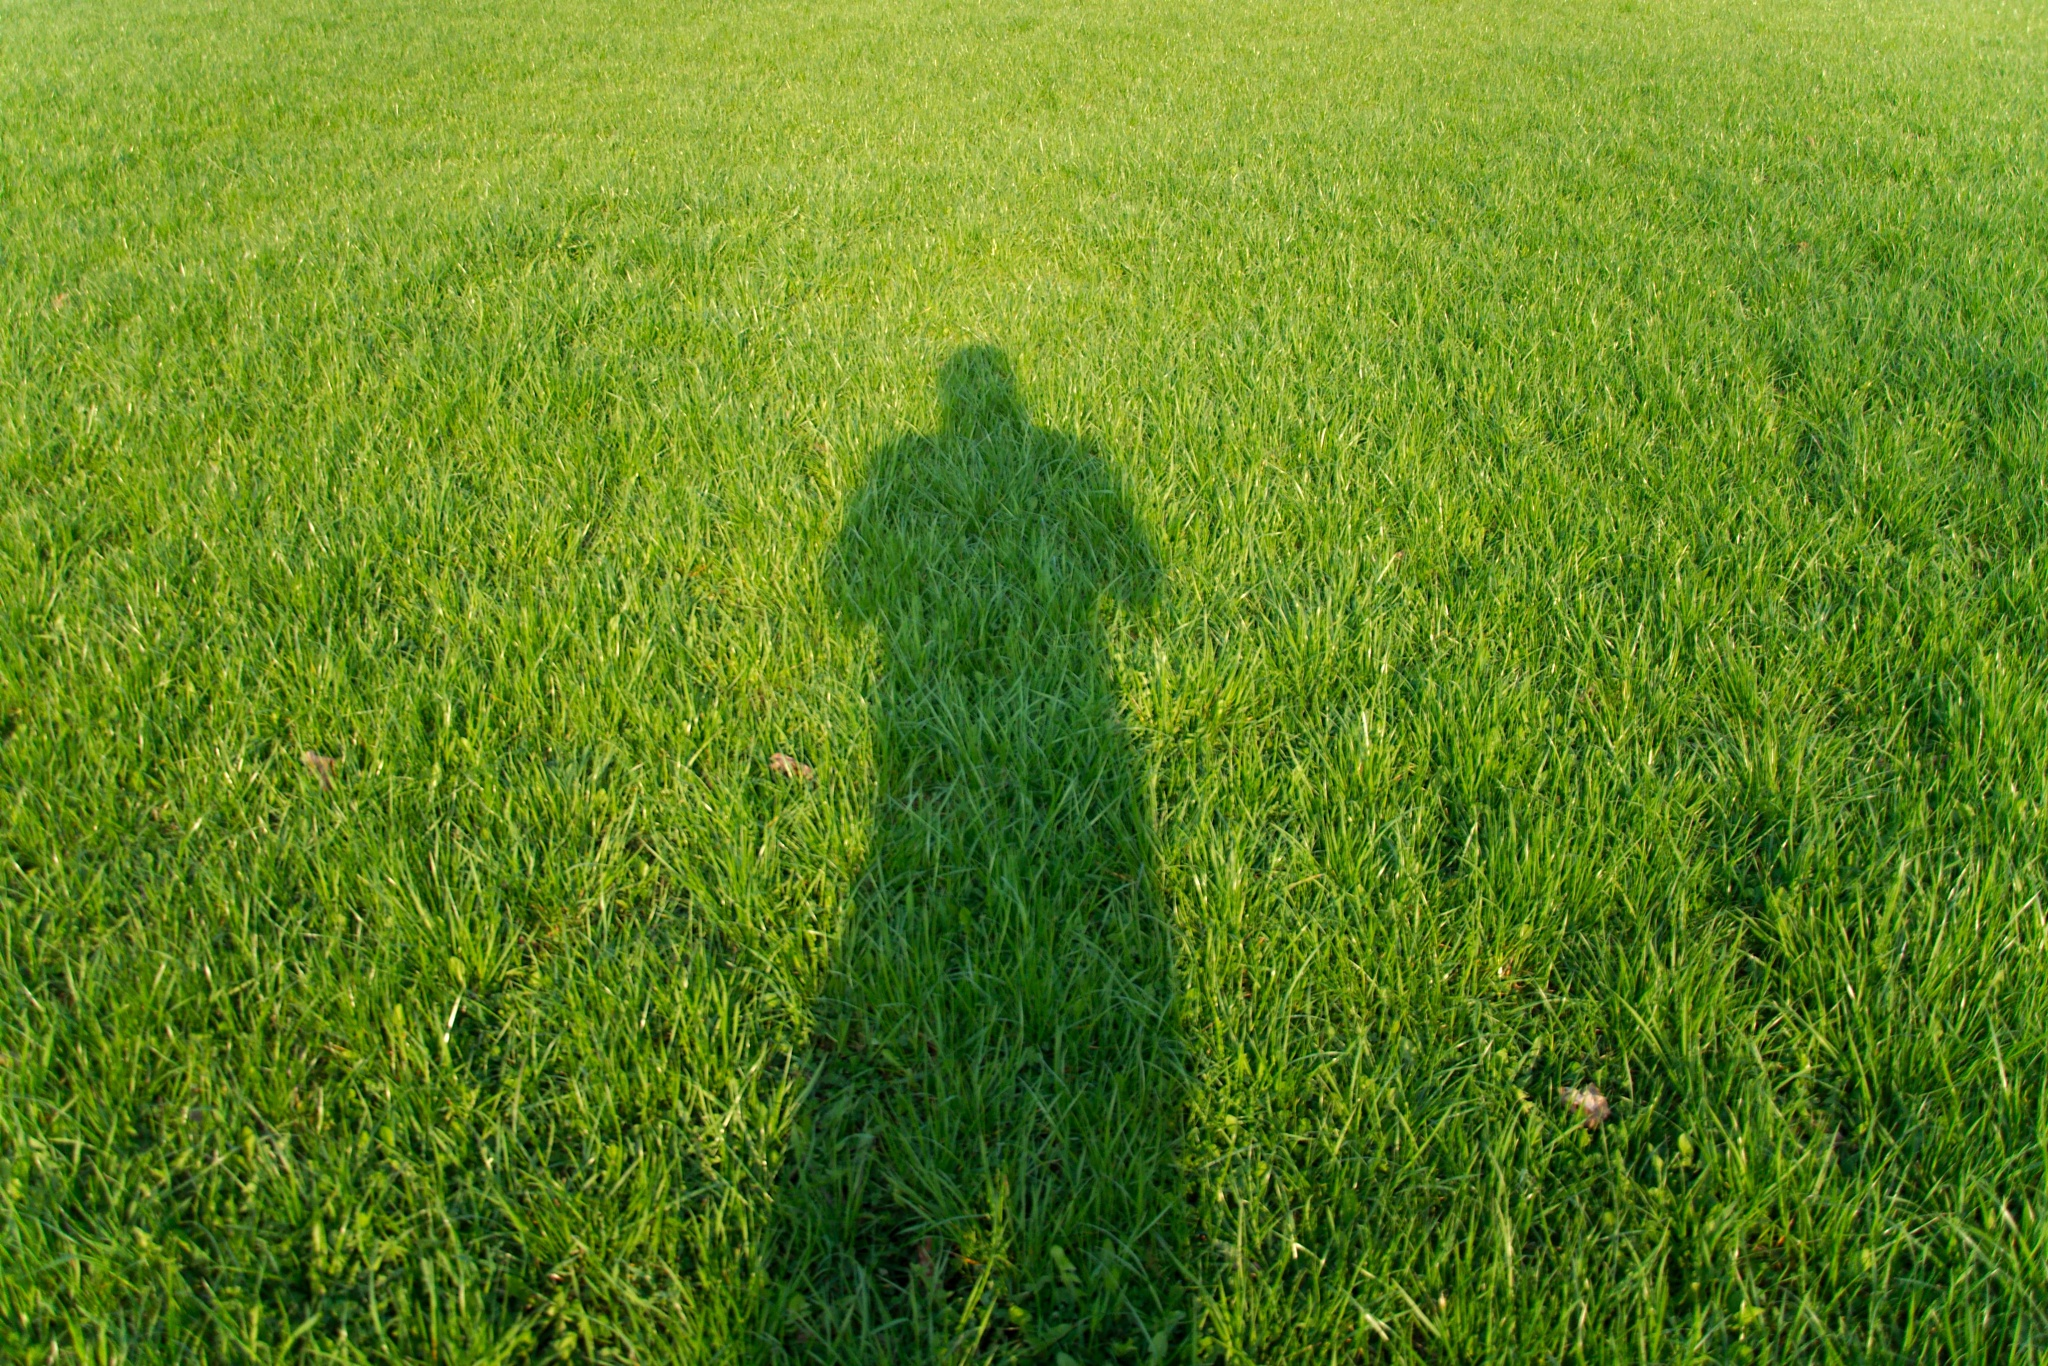 fresh grass by Tomtom79